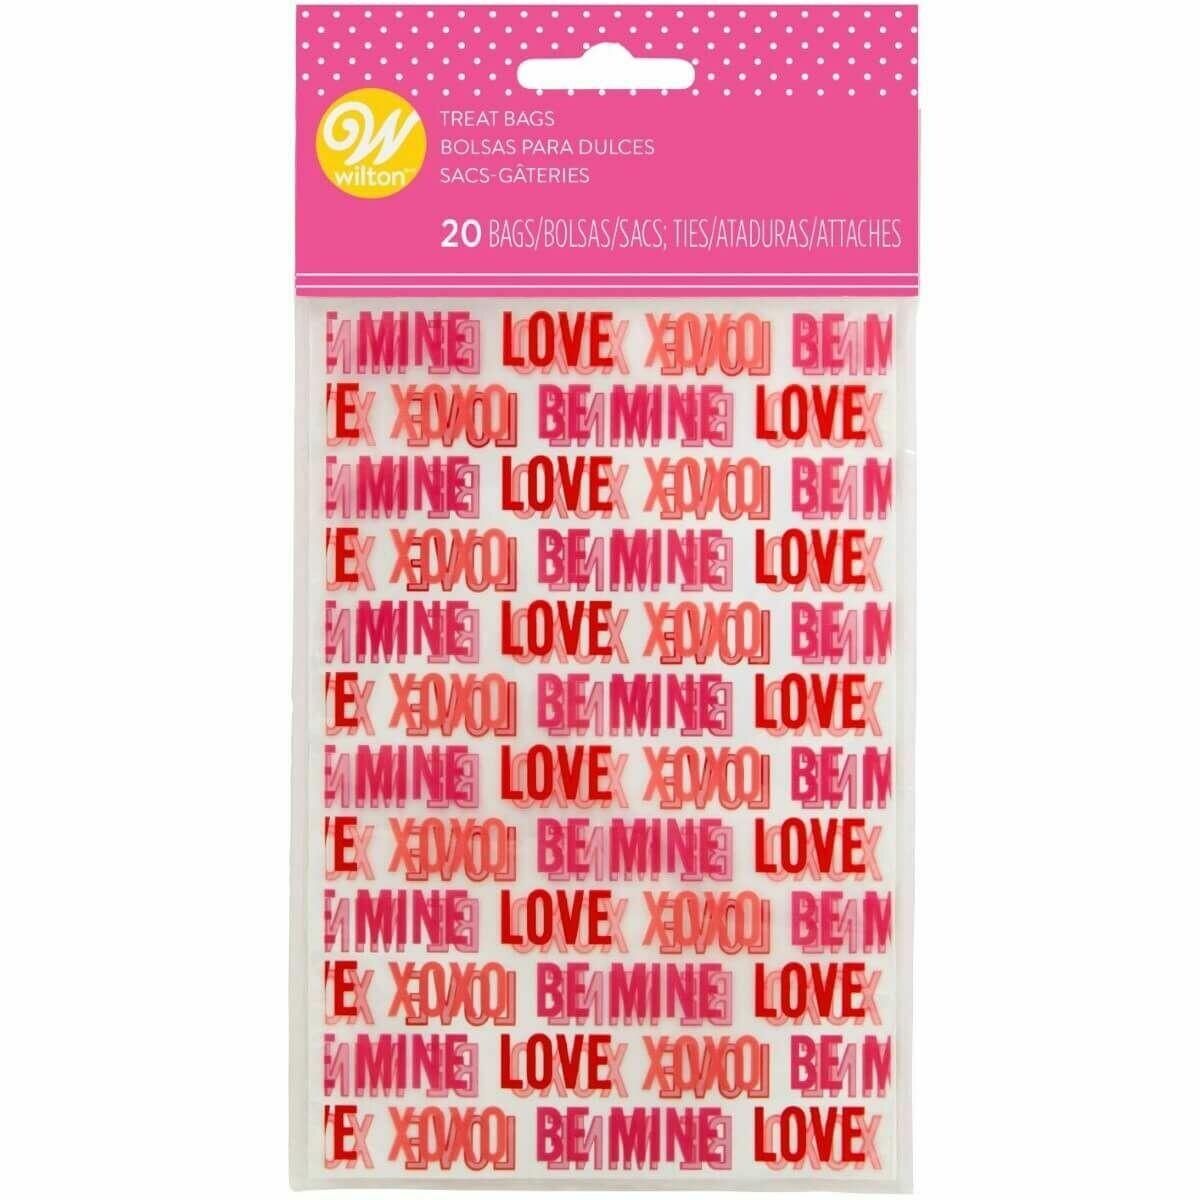 Wilton Valentine Treat Bags -LOVE -Pack of 20 - 20τεμ Σακουλάκια και συρματάκια για γλυκά και ζαχαρωτά